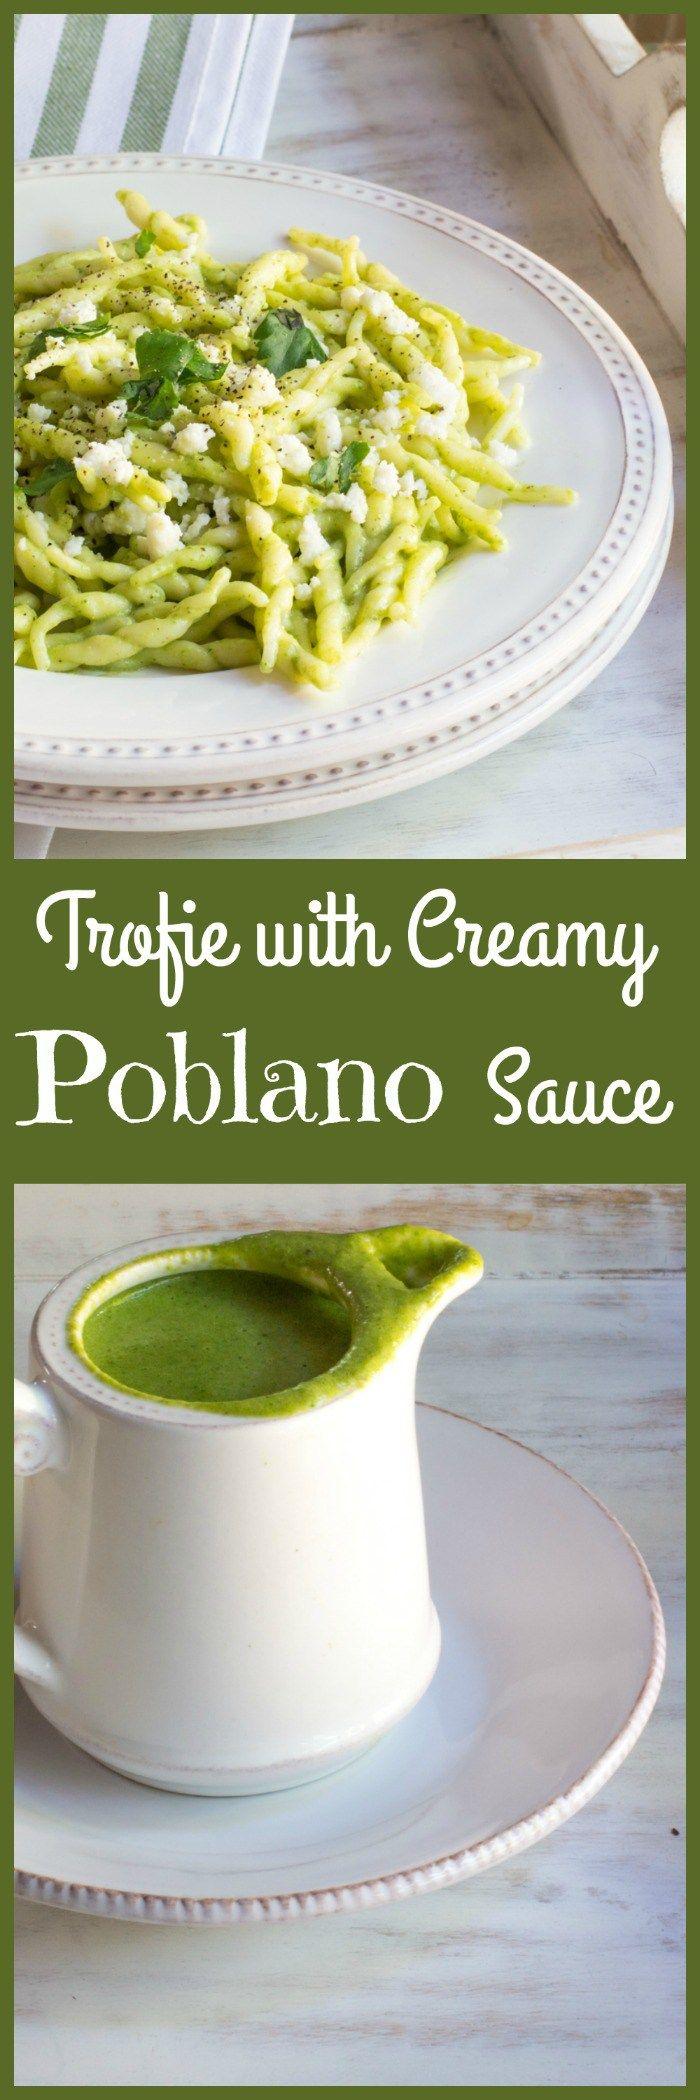 Trofie Pasta with Creamy Poblano Sauce